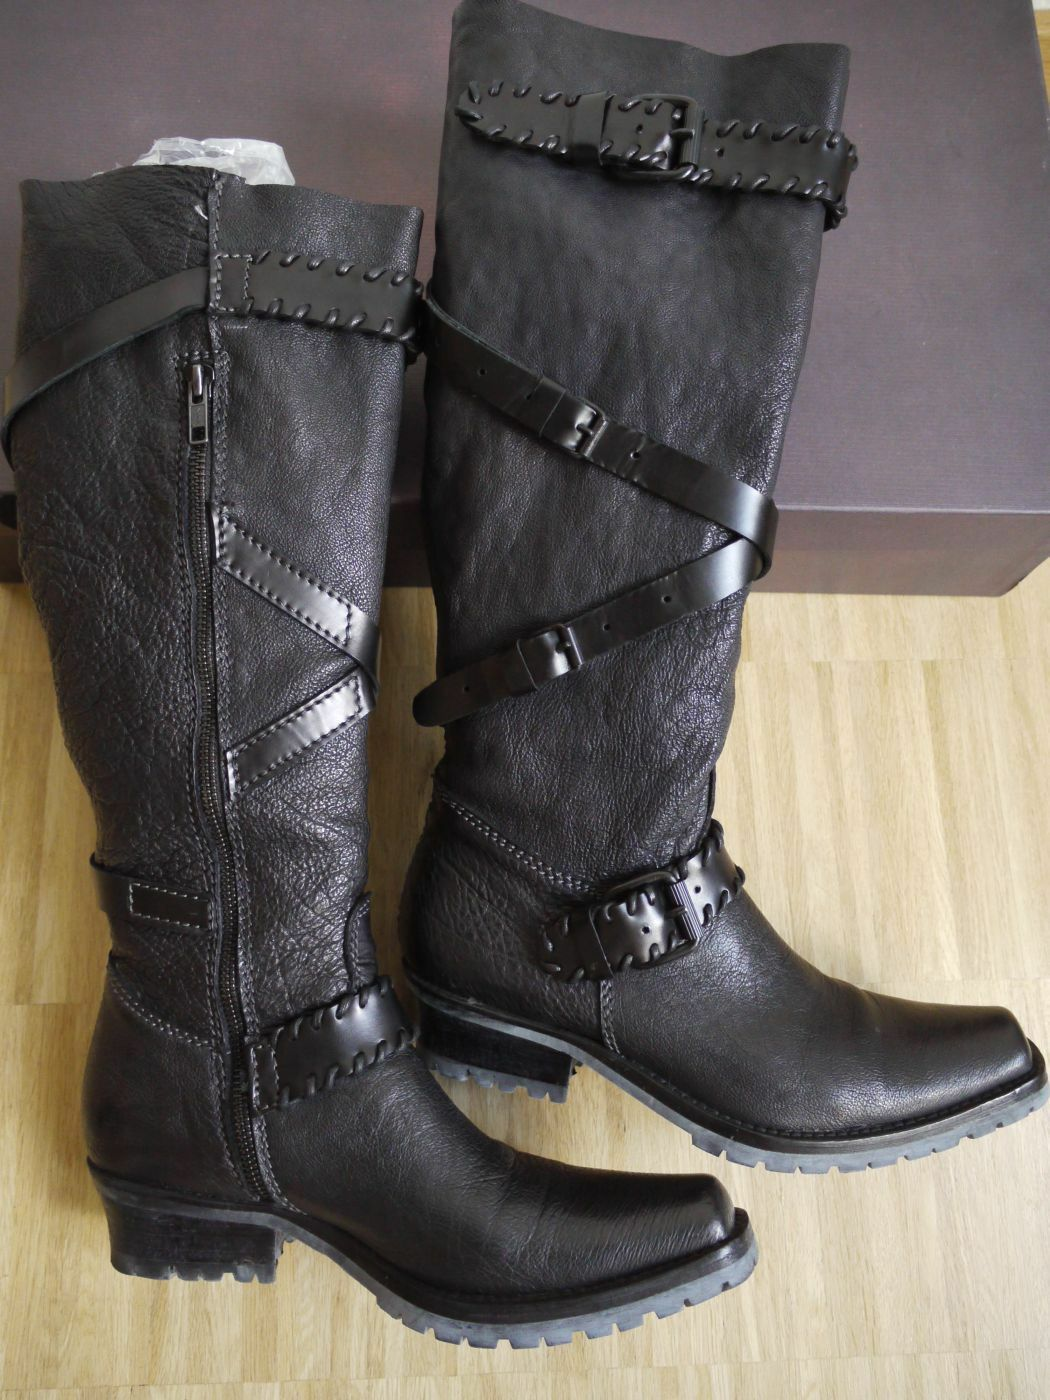 PRIMA BASE Stiefel mit  Gürtel  Voll-Leder + Profilsohle Gr.37-38 schwarz NP